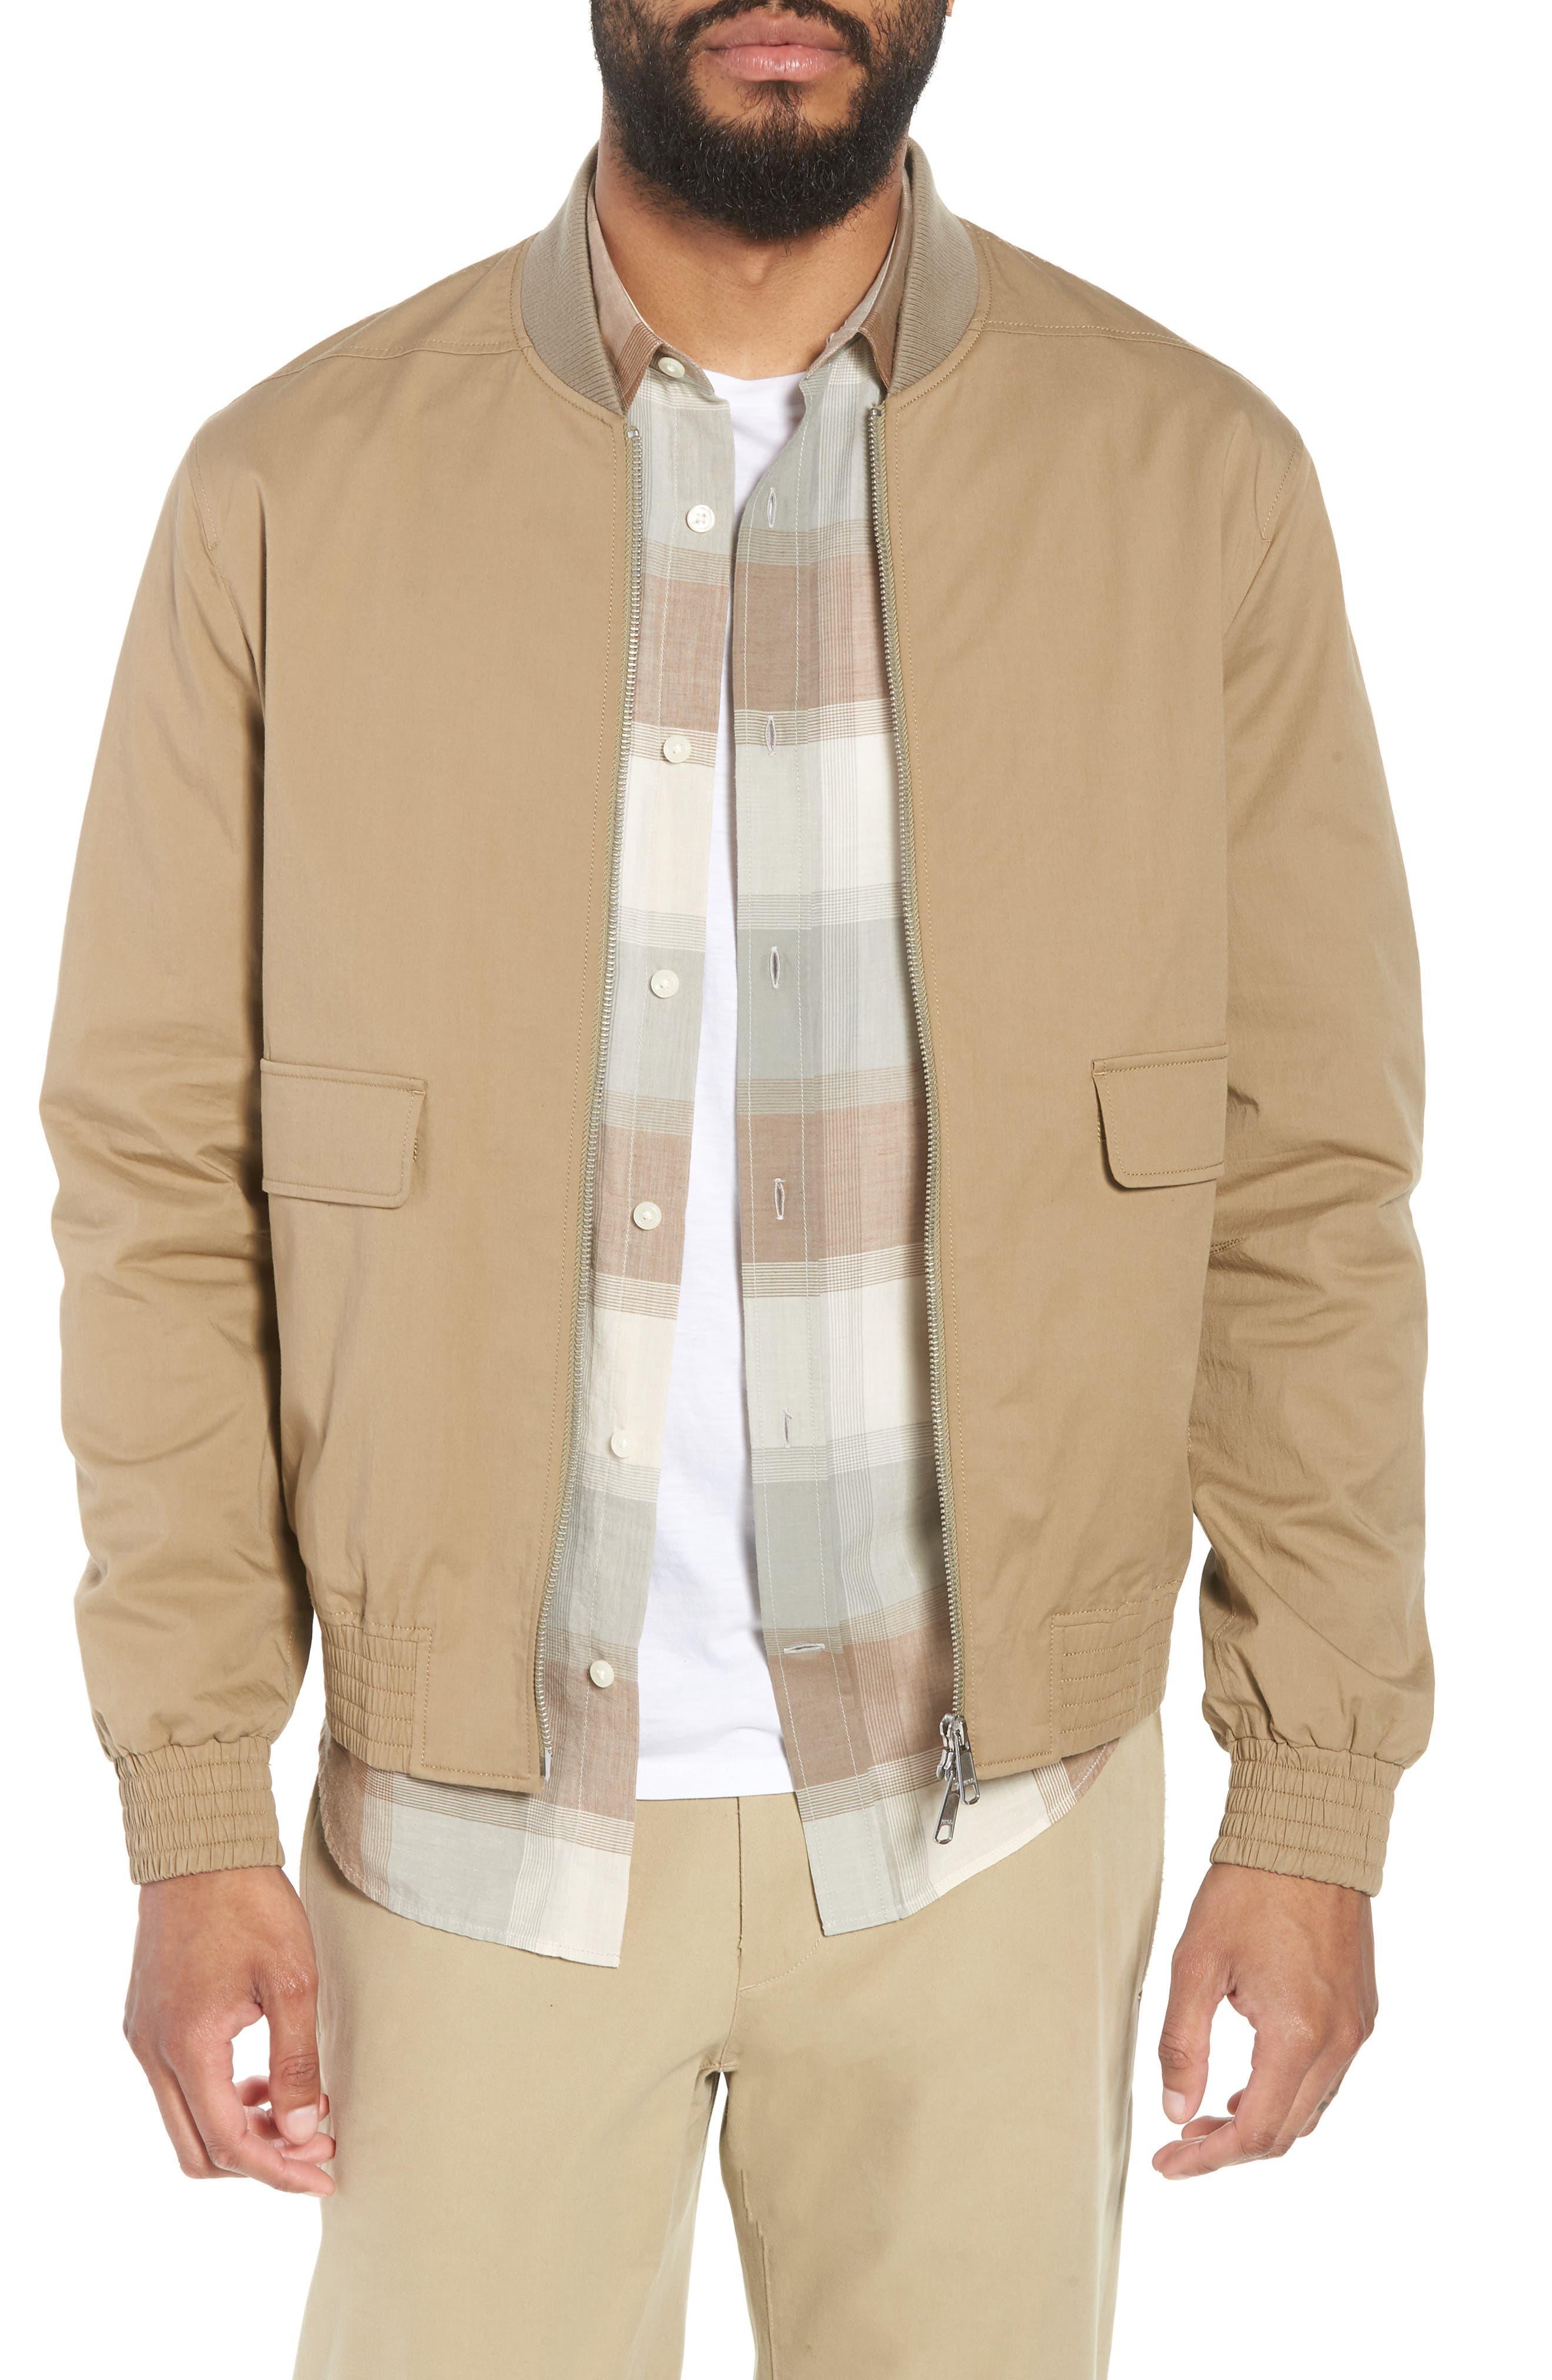 Regular Fit Bomber Jacket,                         Main,                         color, STONE KHAKI